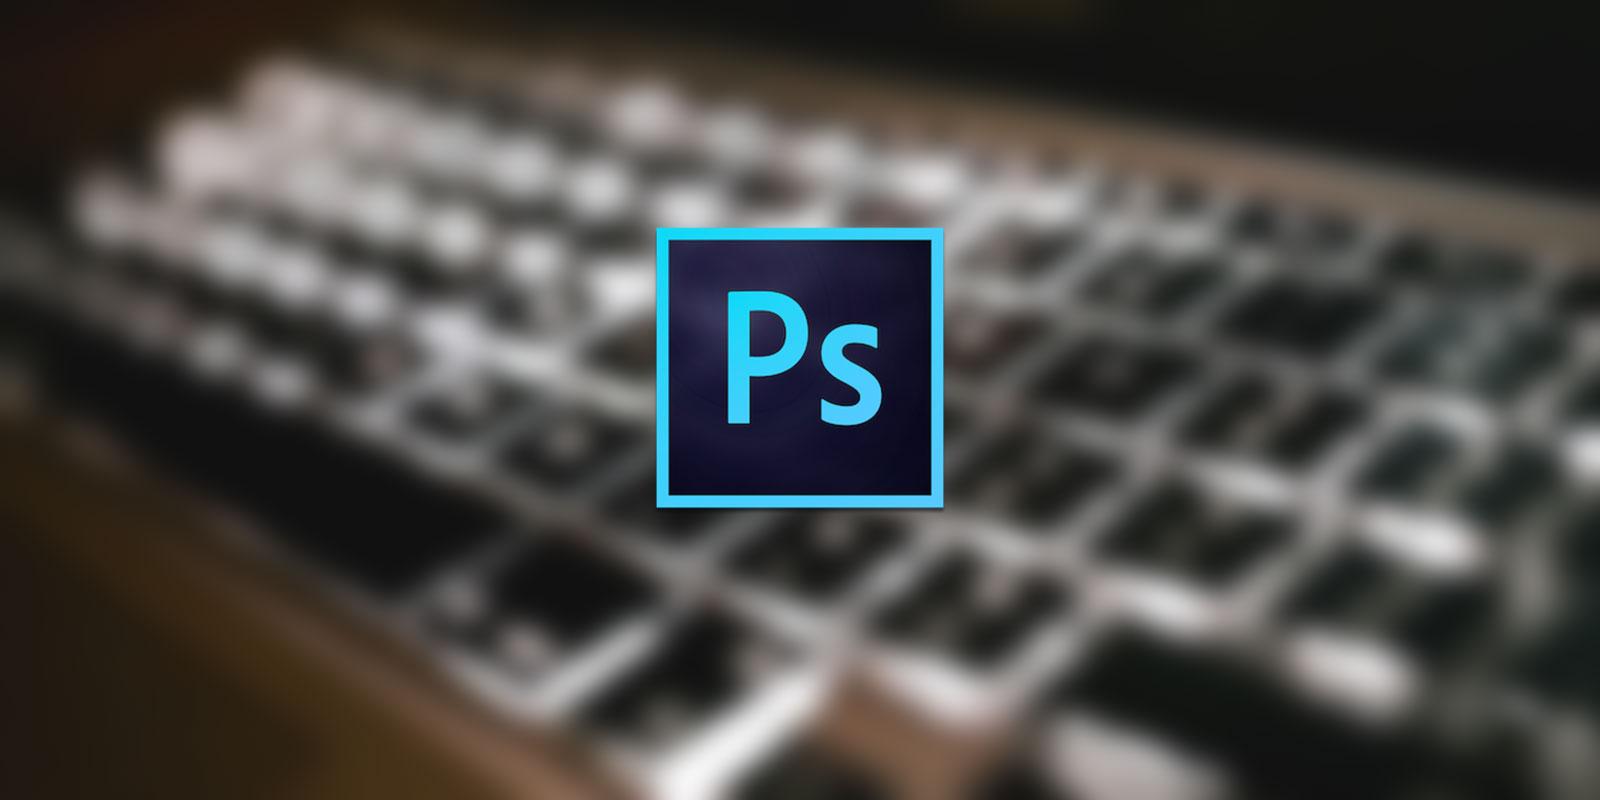 [Mac] Photoshopのコピースタンプツールを使用中にキーボードが効かなくなる件